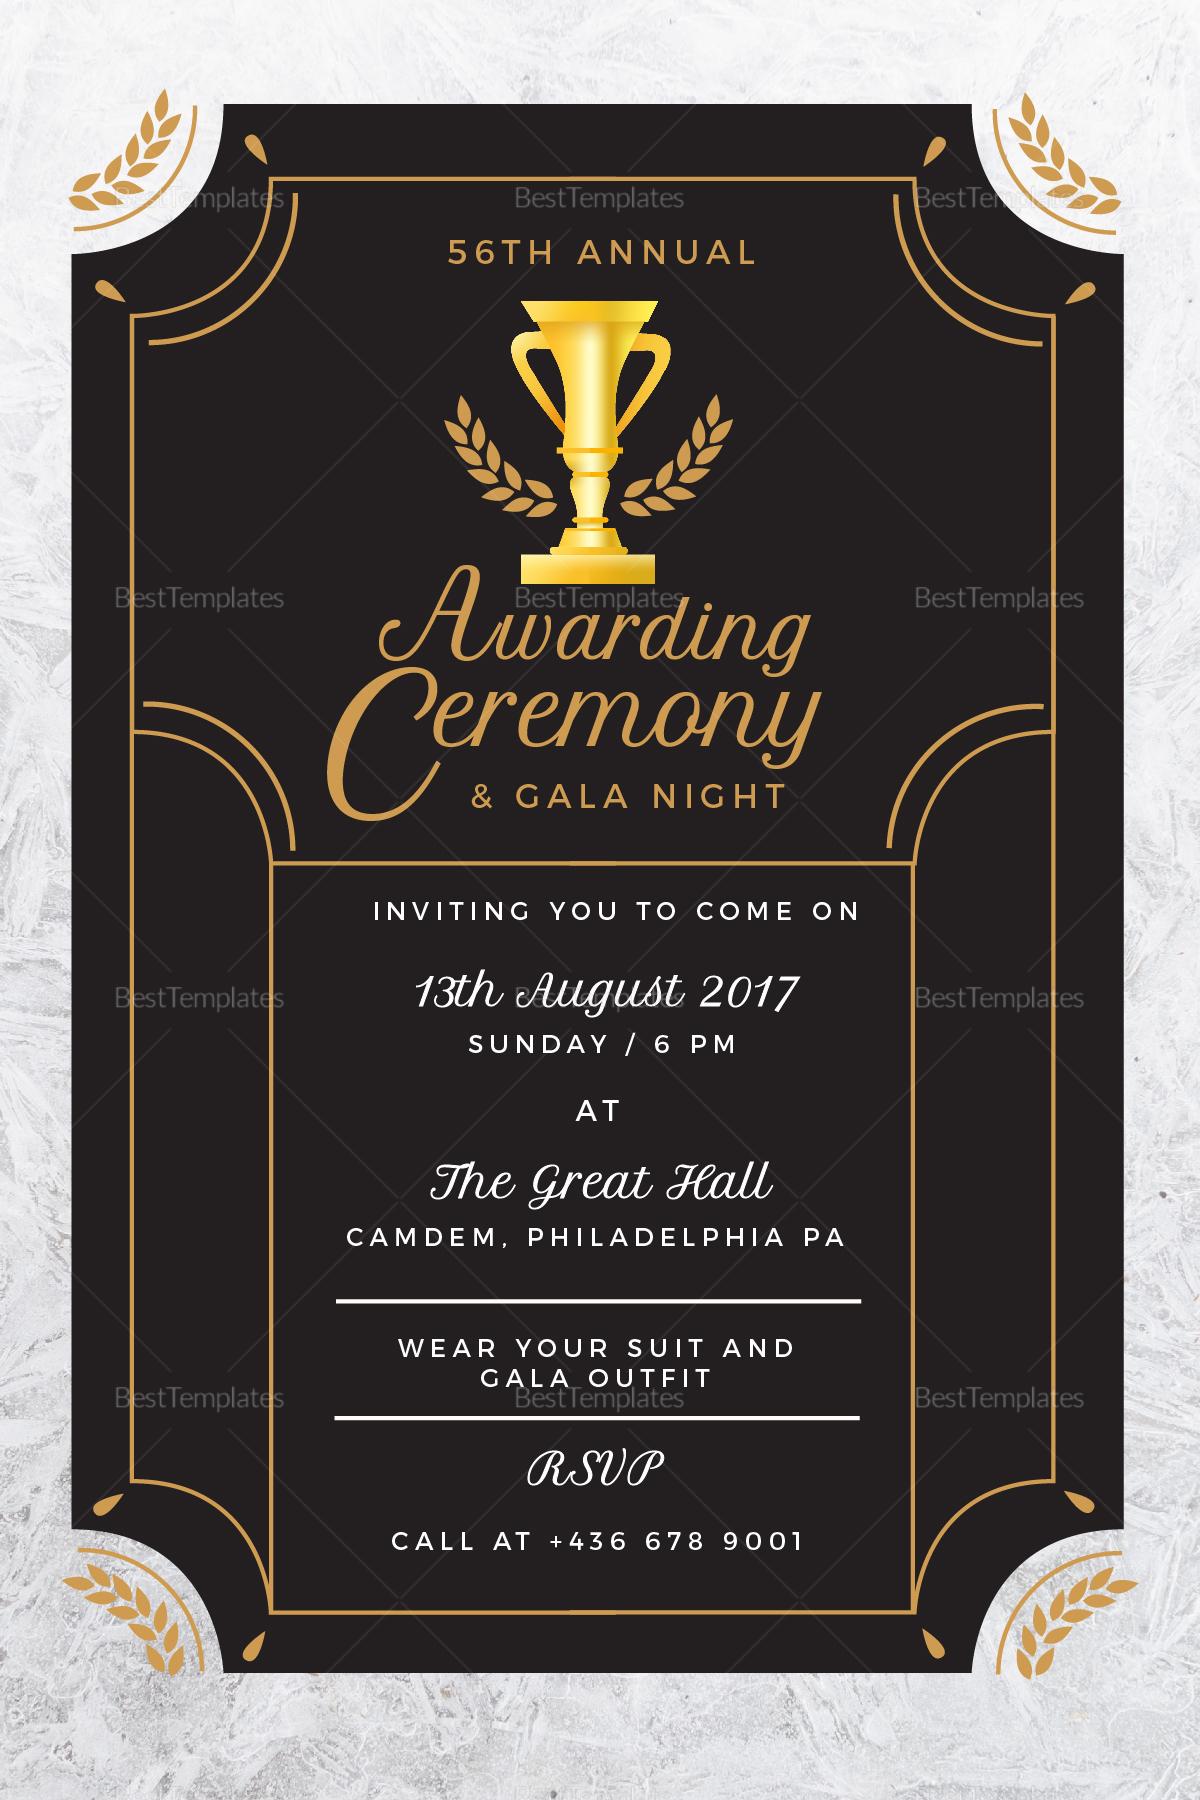 Sample Annual Award Ceremony Invitation Template